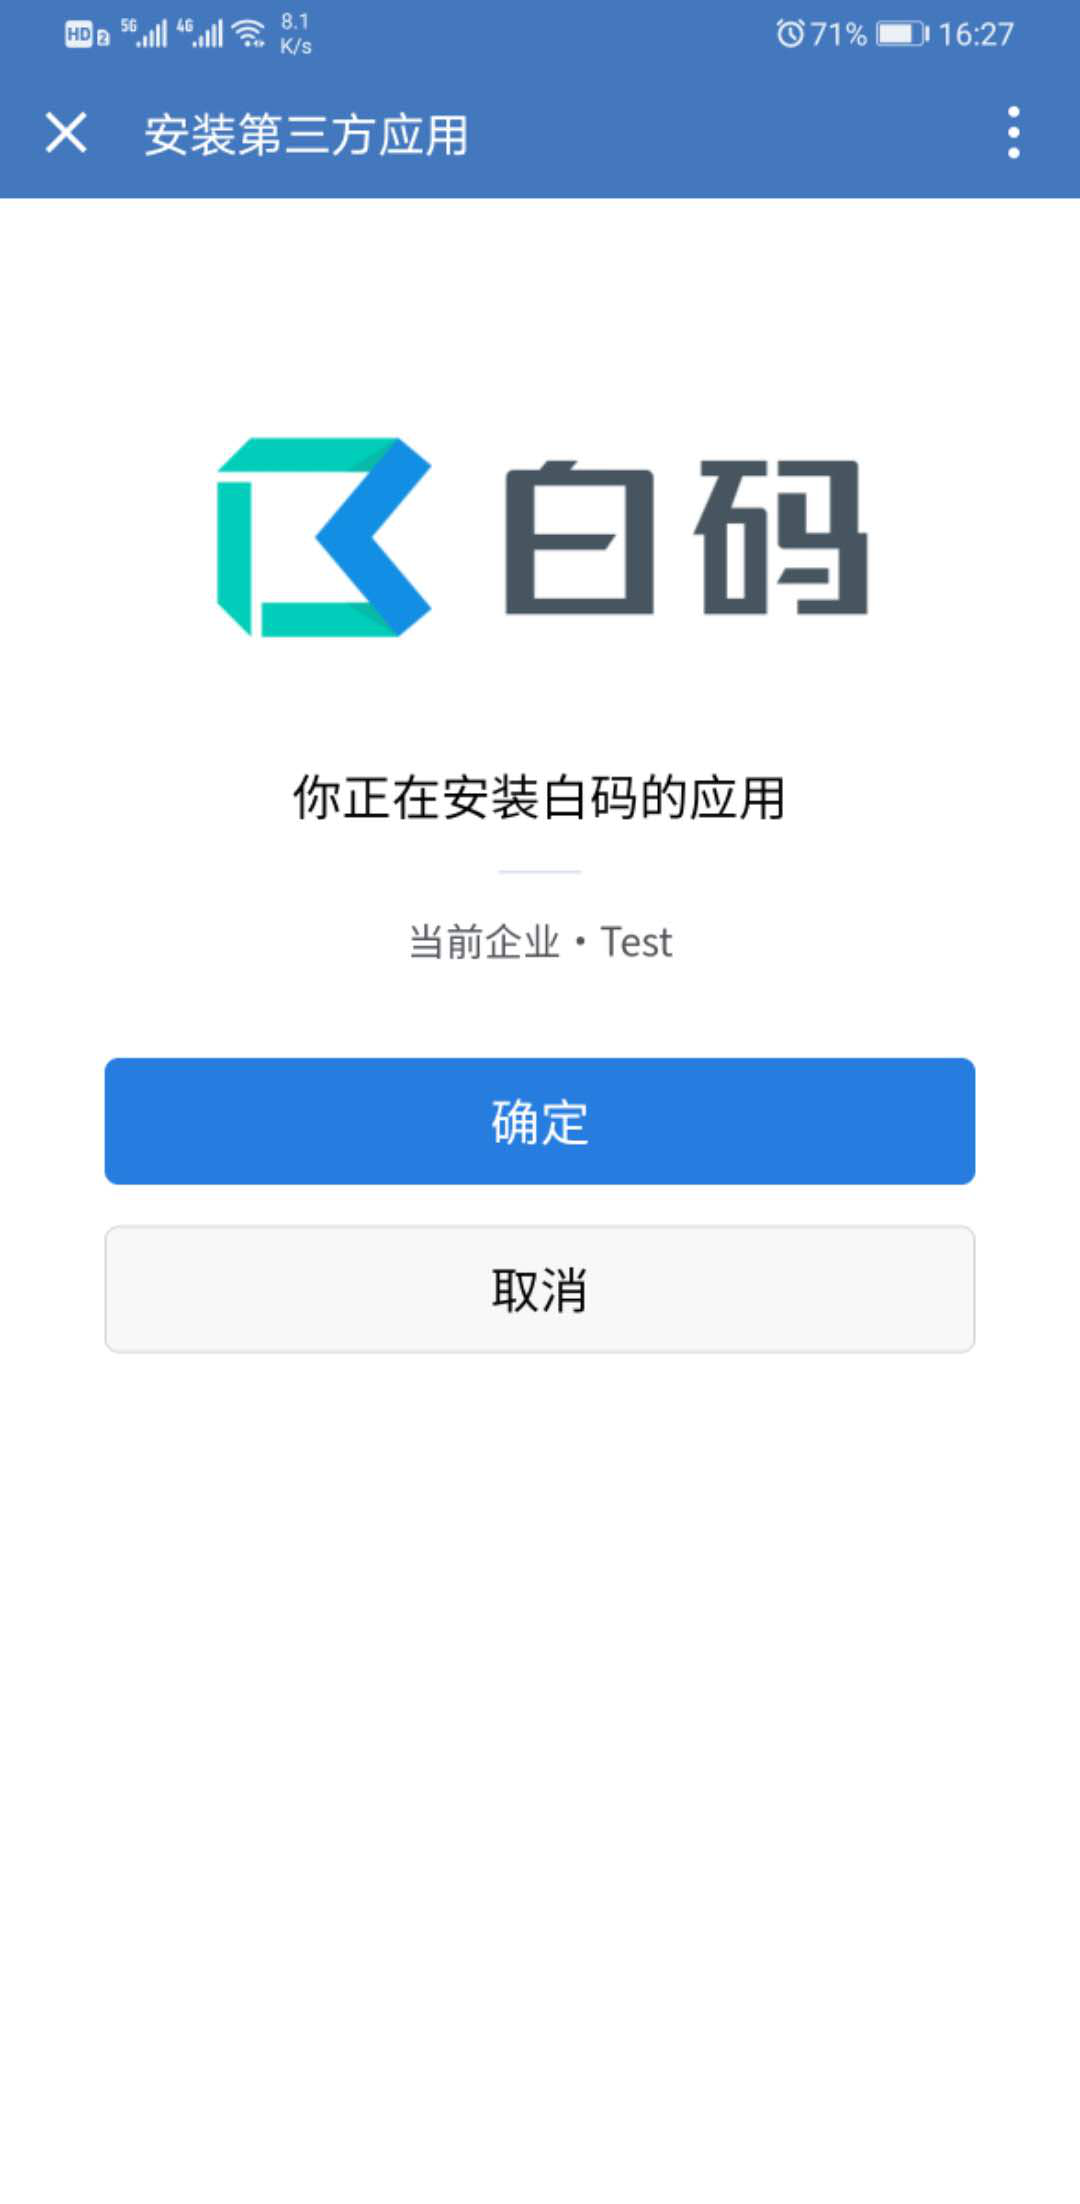 https://pan.bnocode.com/project/5ccfc7ad044c8e018c8c5d36/attachment/20200924/1600941780531_%E5%9B%BE%E7%89%877.png